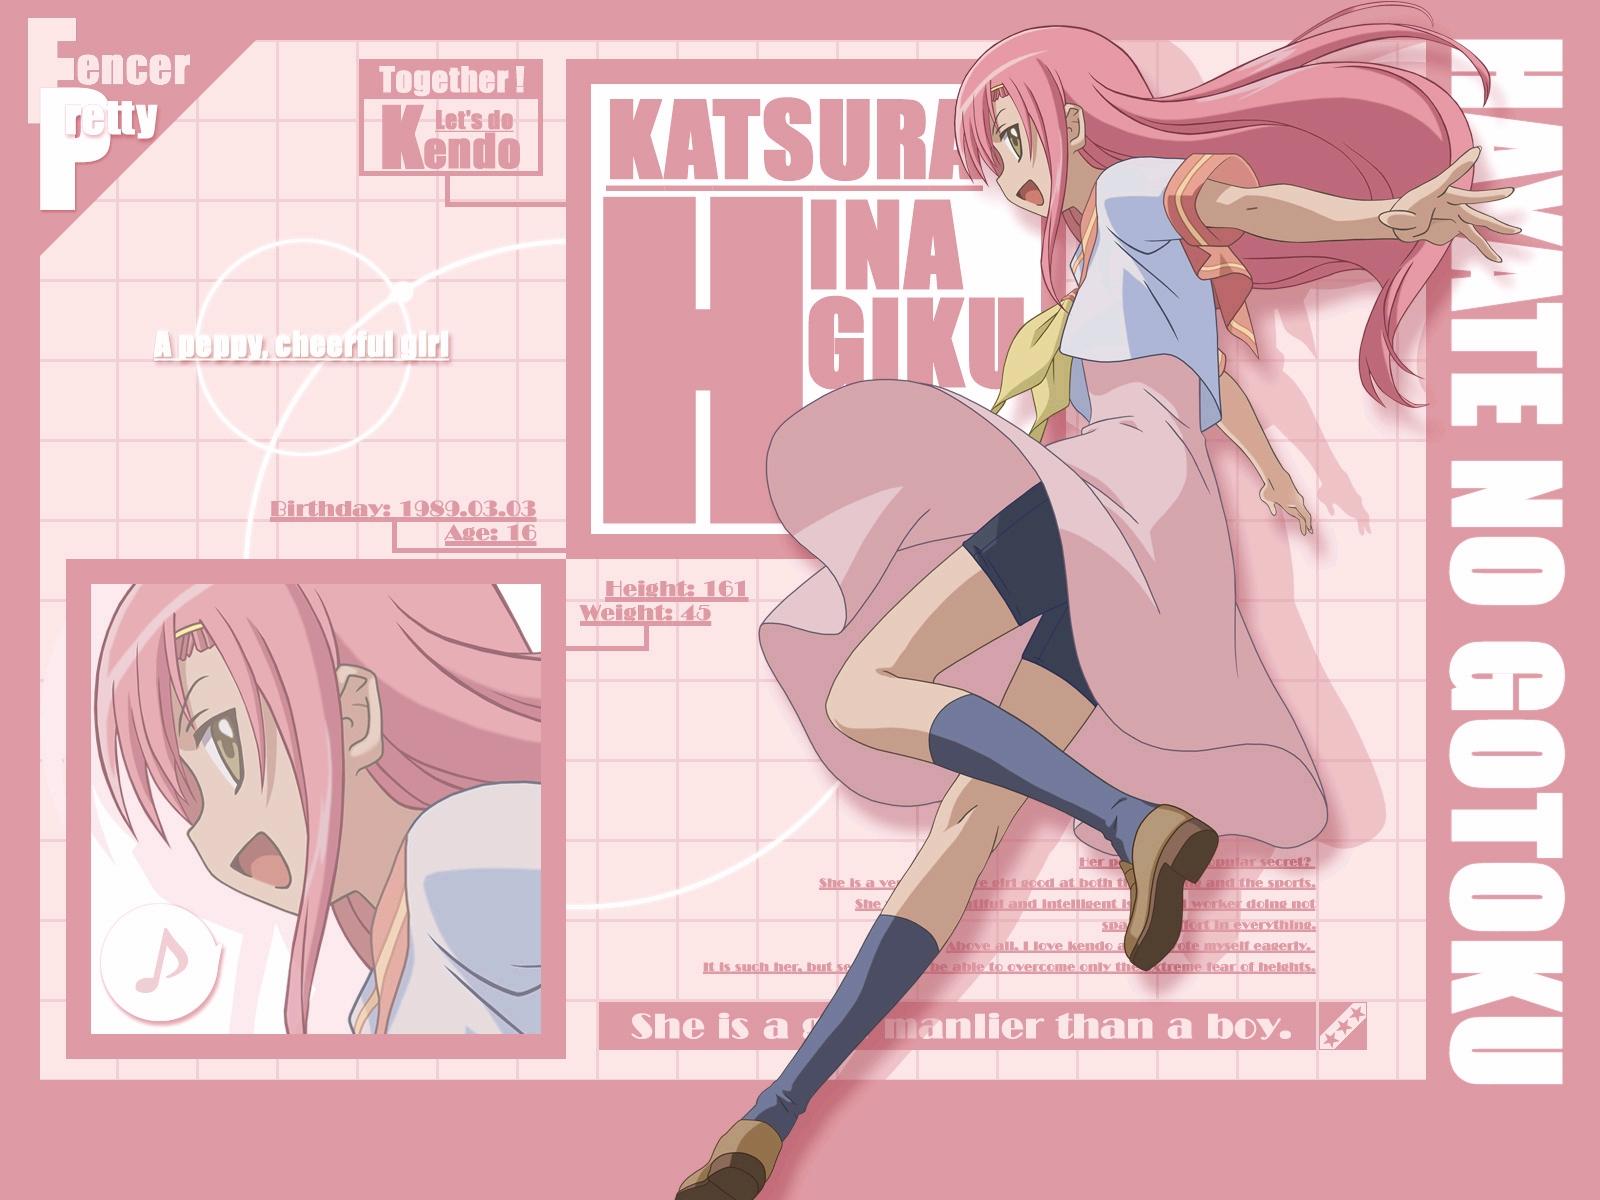 hayate_no_gotoku katsura_hinagiku long_hair pink_hair